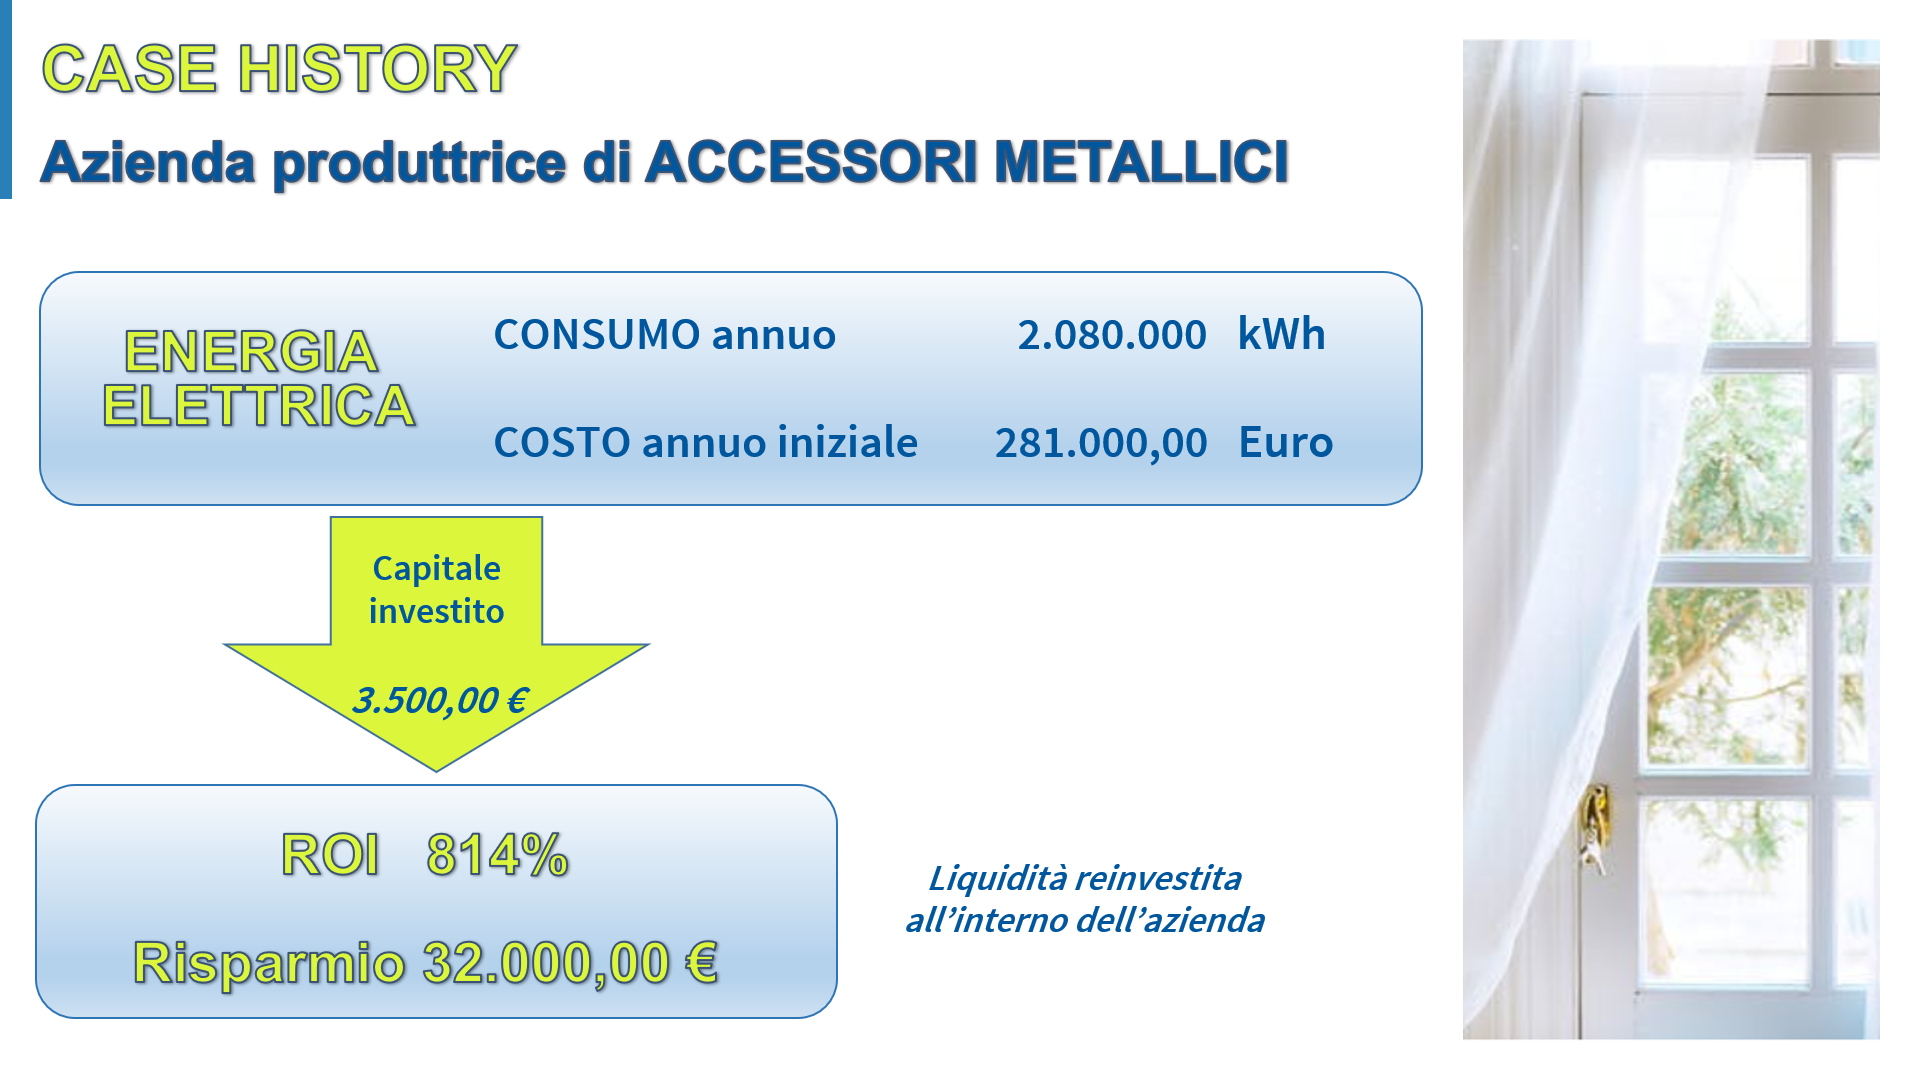 CASE HISTORY 8 – Azienda produttrice di accessori metallici